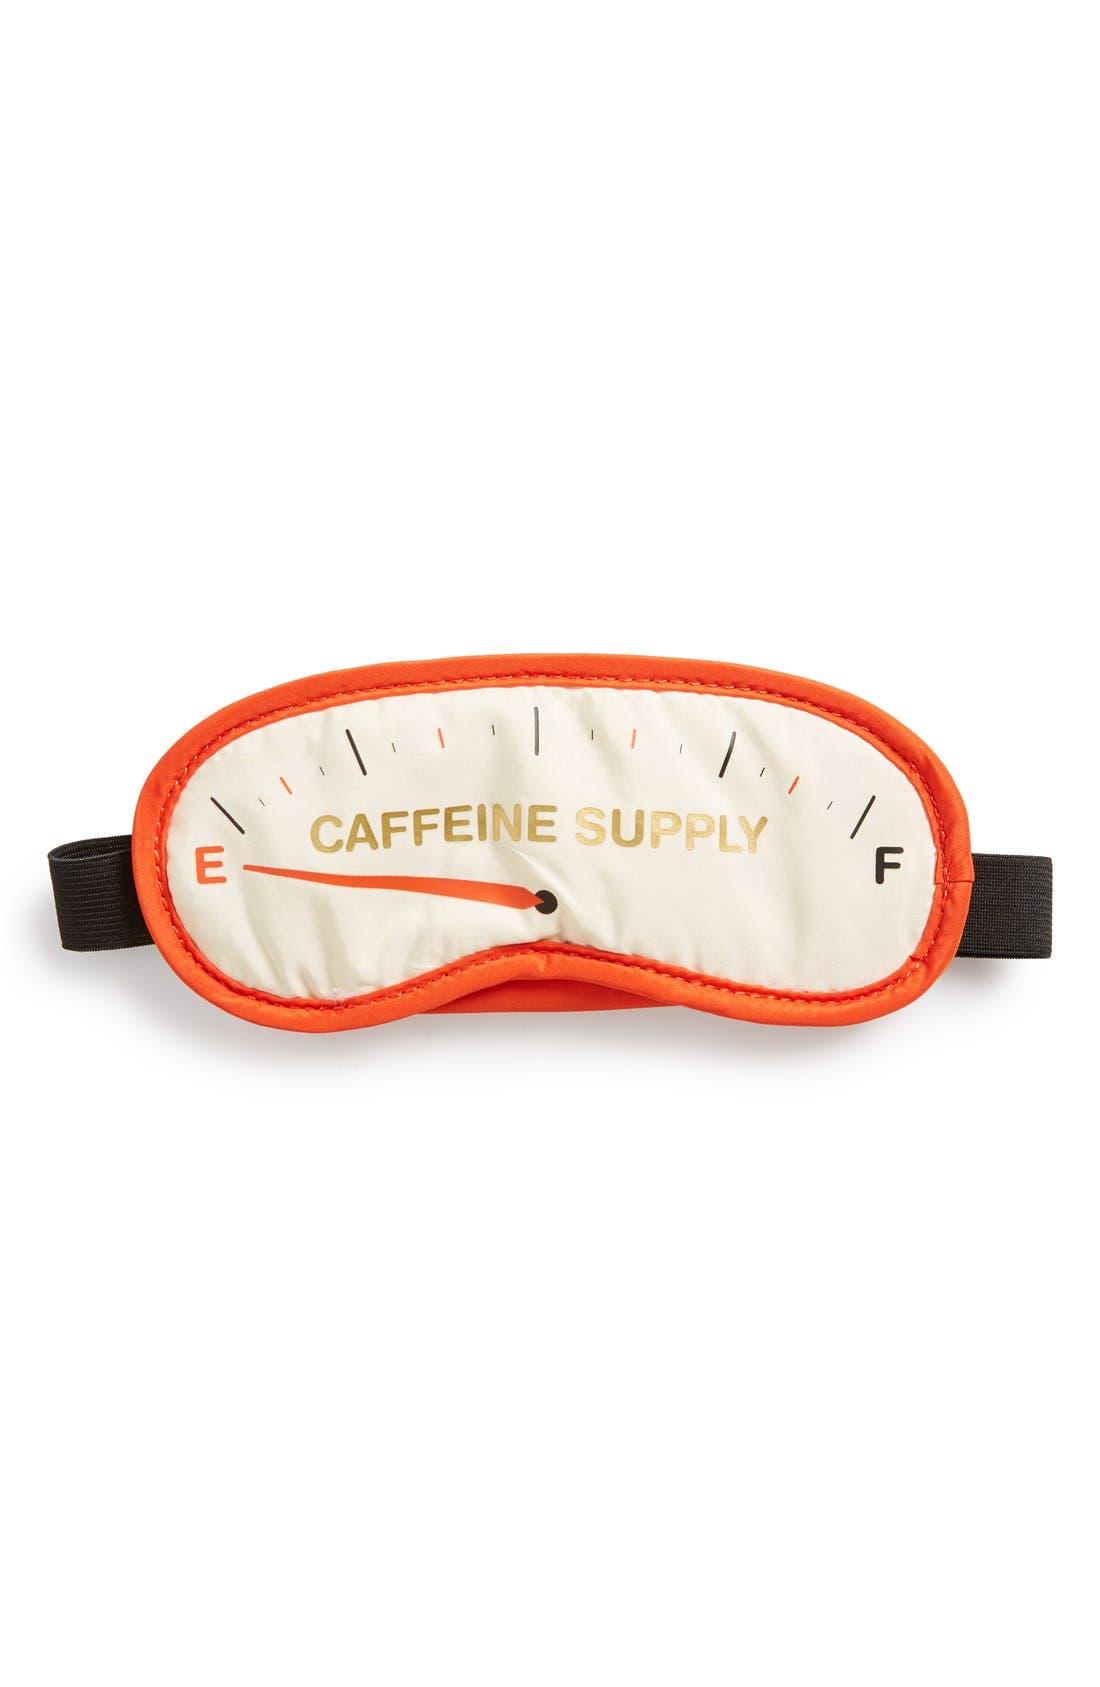 Alternate Image 1 Selected - Flight 001 'Caffeine Supply' Sleep Mask